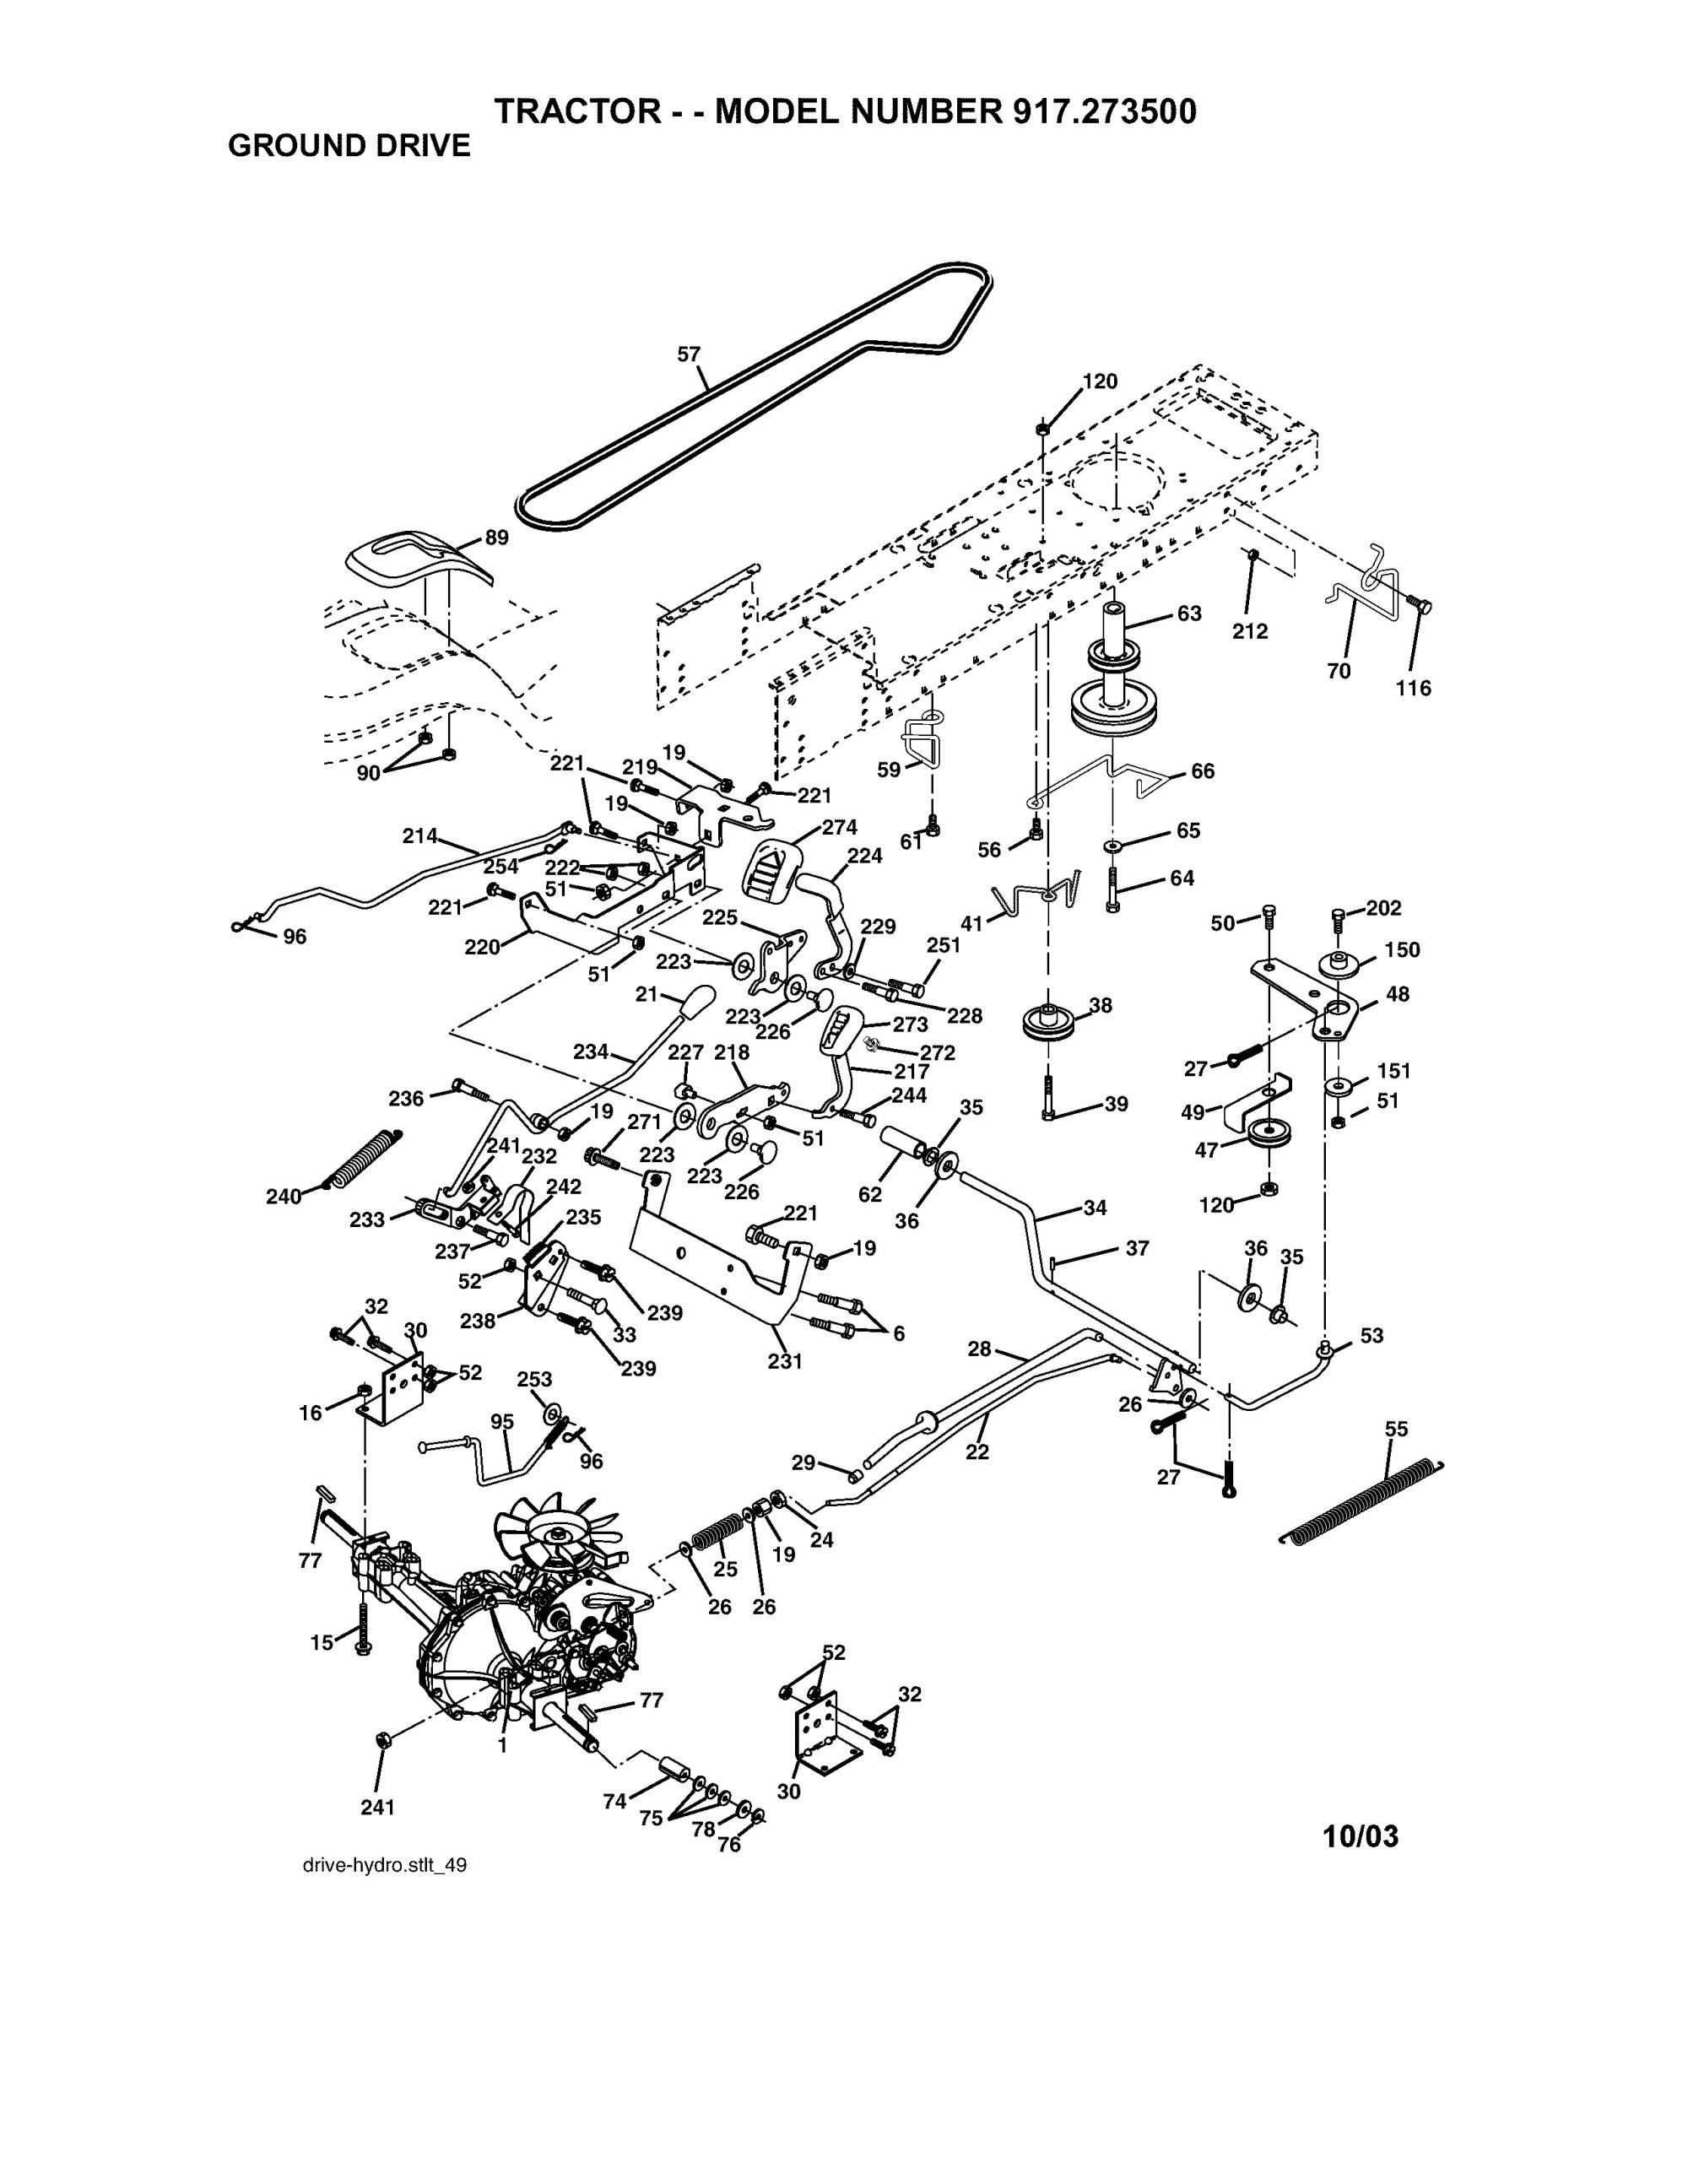 hight resolution of gt5000 wiring diagram wiring diagram blogs rh 2 2 restaurant freinsheimer hof de craftsman gt5000 belt diagram craftsman wiring schematic